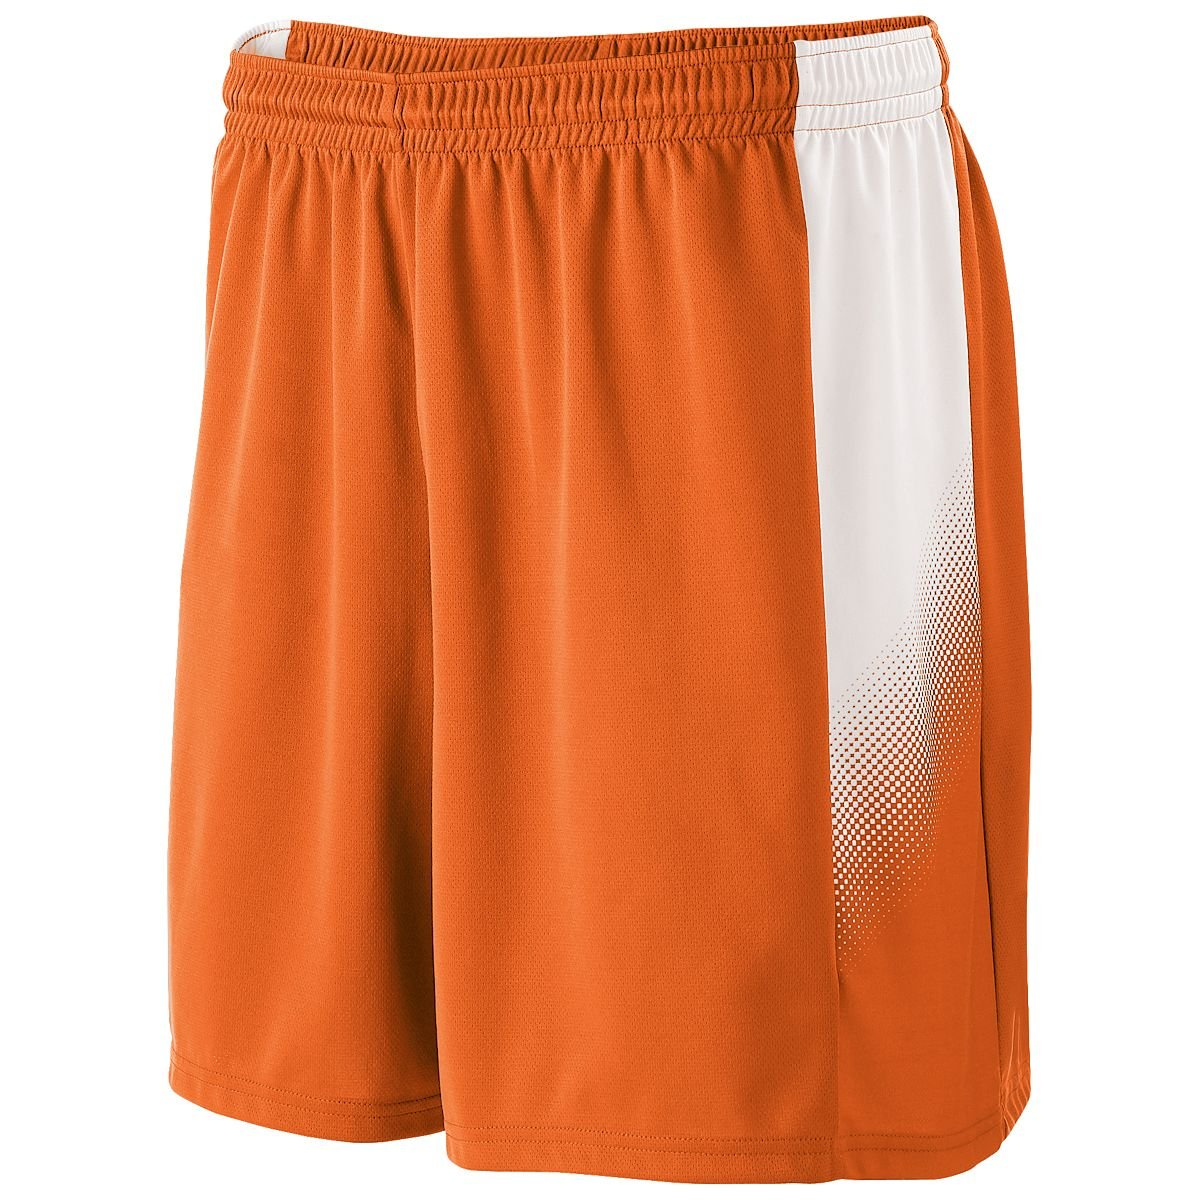 Orange//White Large High Five Mens Elasticized Waistband Ionic Soccer Short